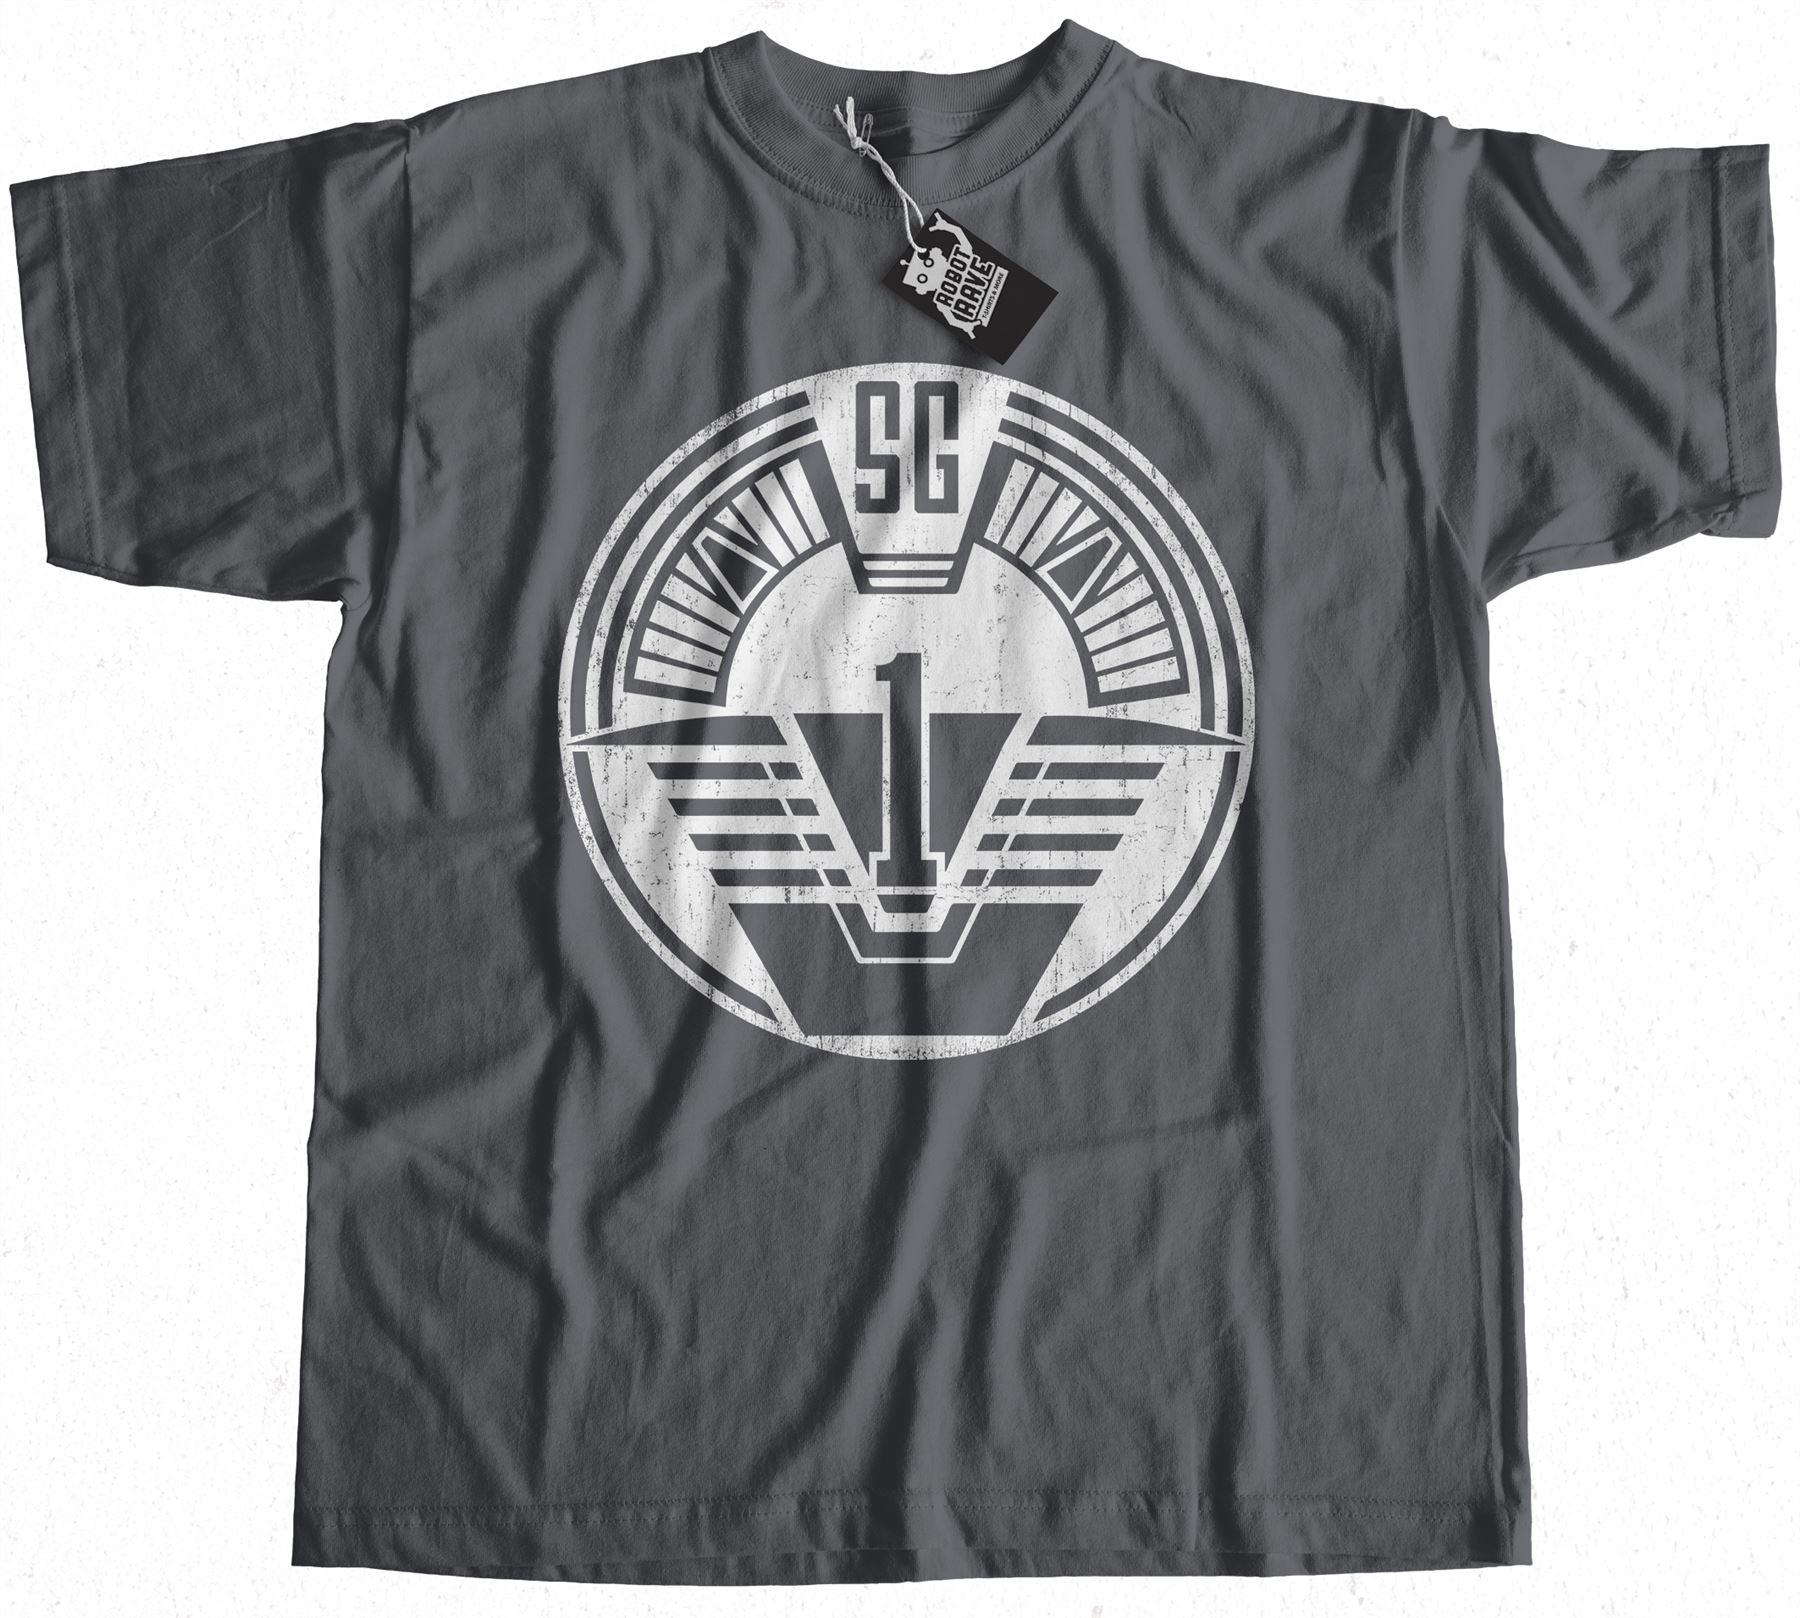 SG1-T-Shirt-100-Premium-Cotton Indexbild 13